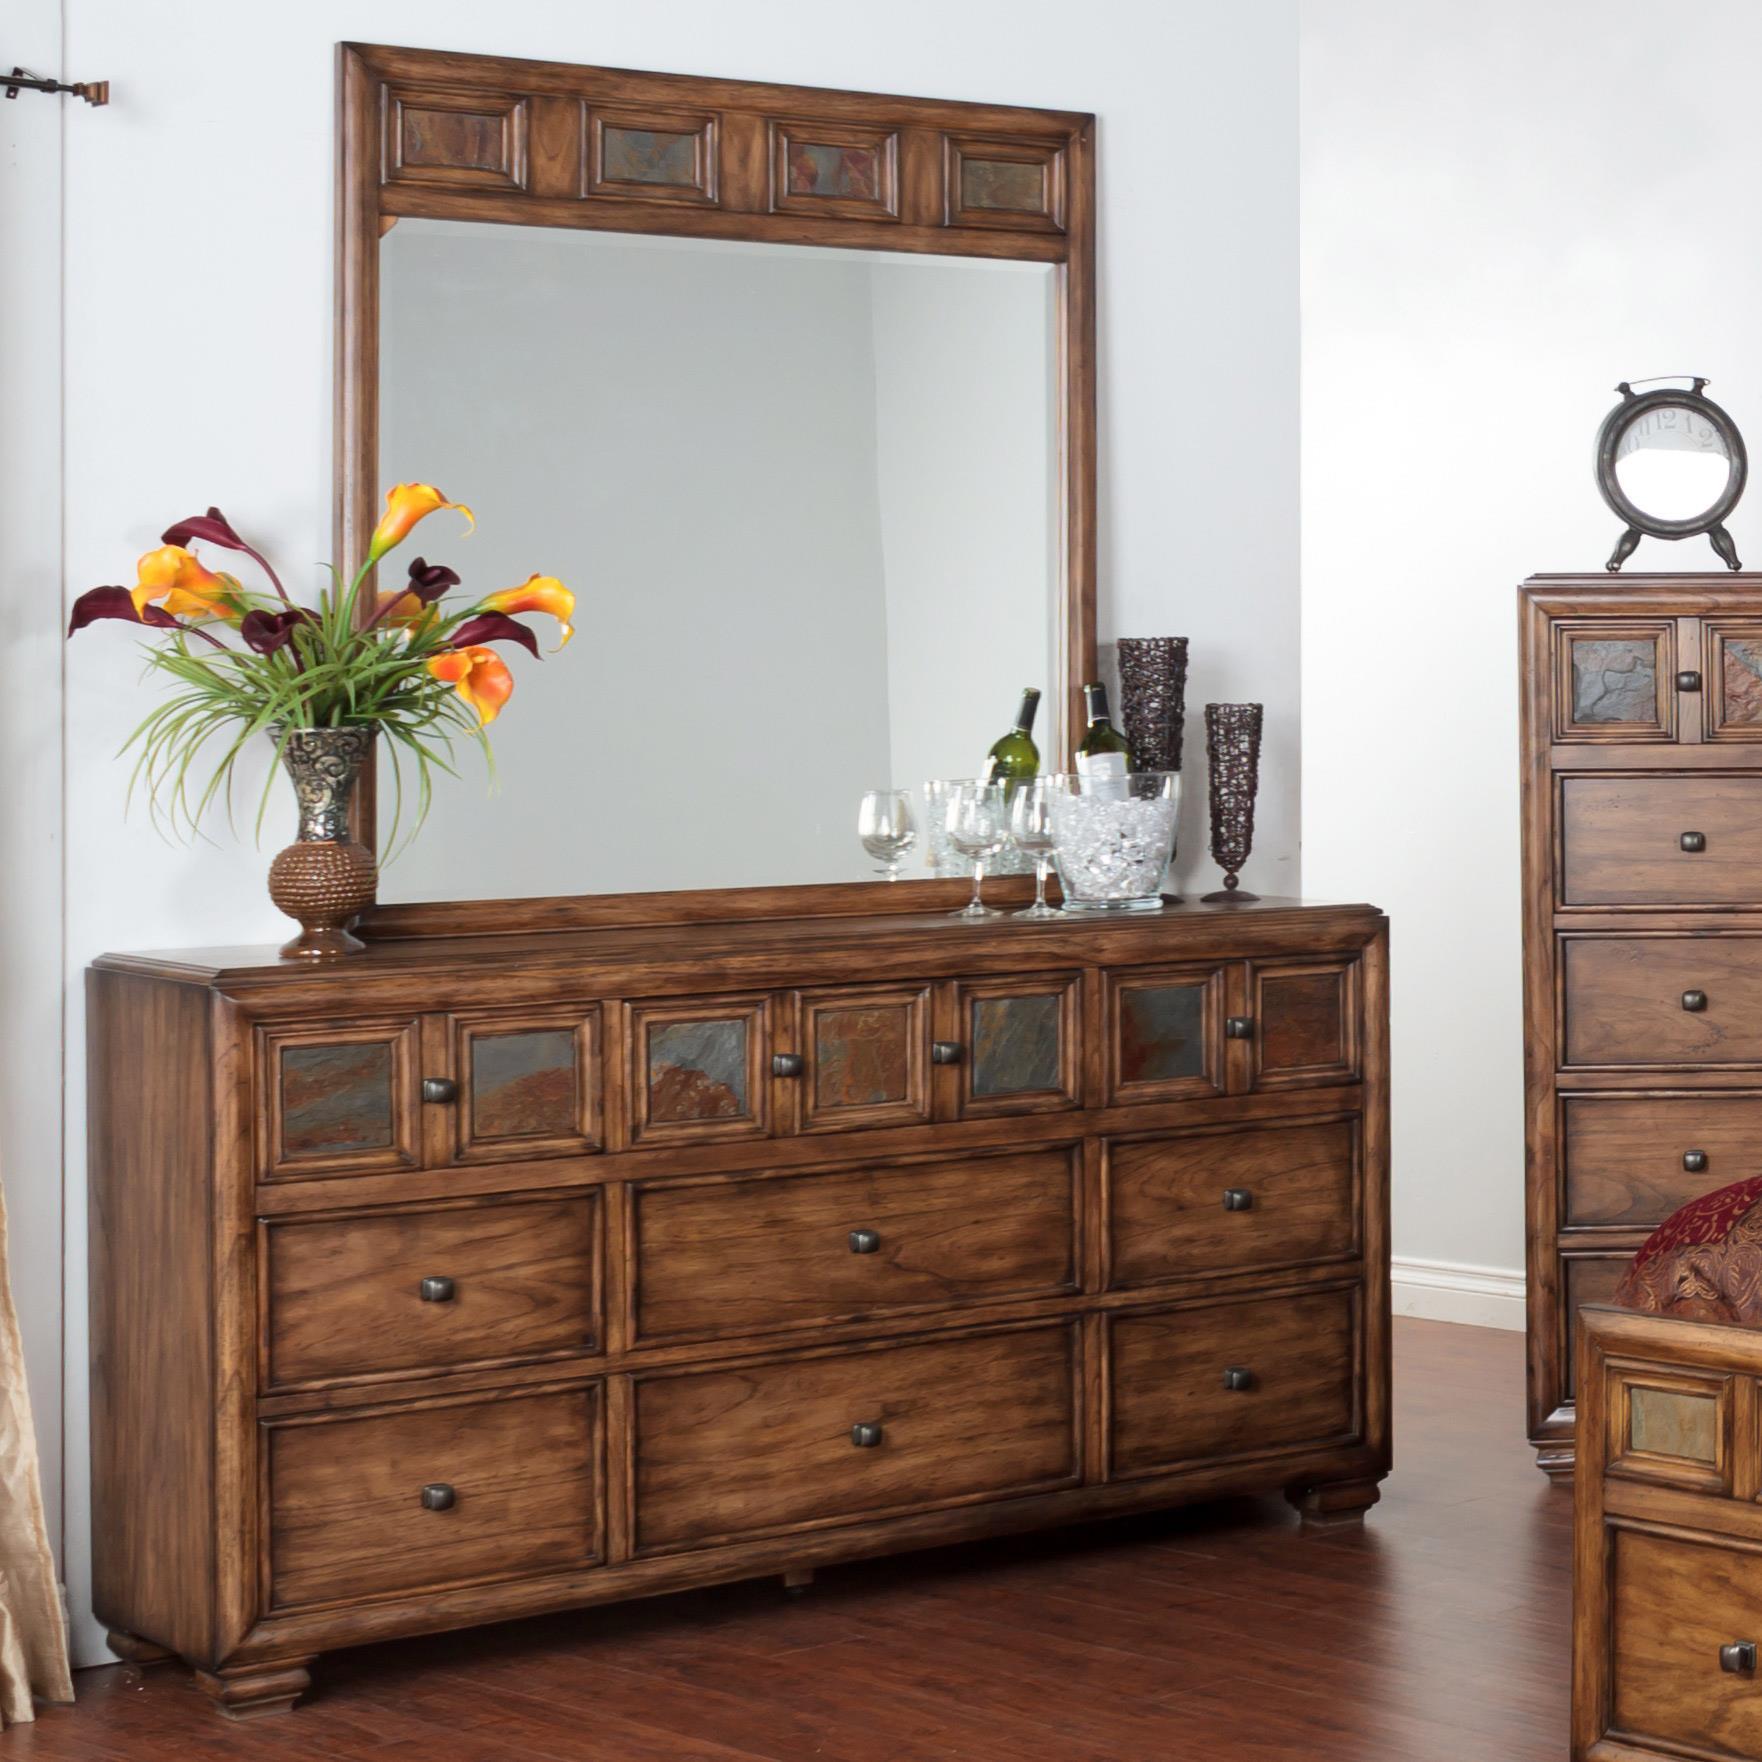 Sunny Designs Coventry Dresser & Mirror - Item Number: 2378BM-D+M